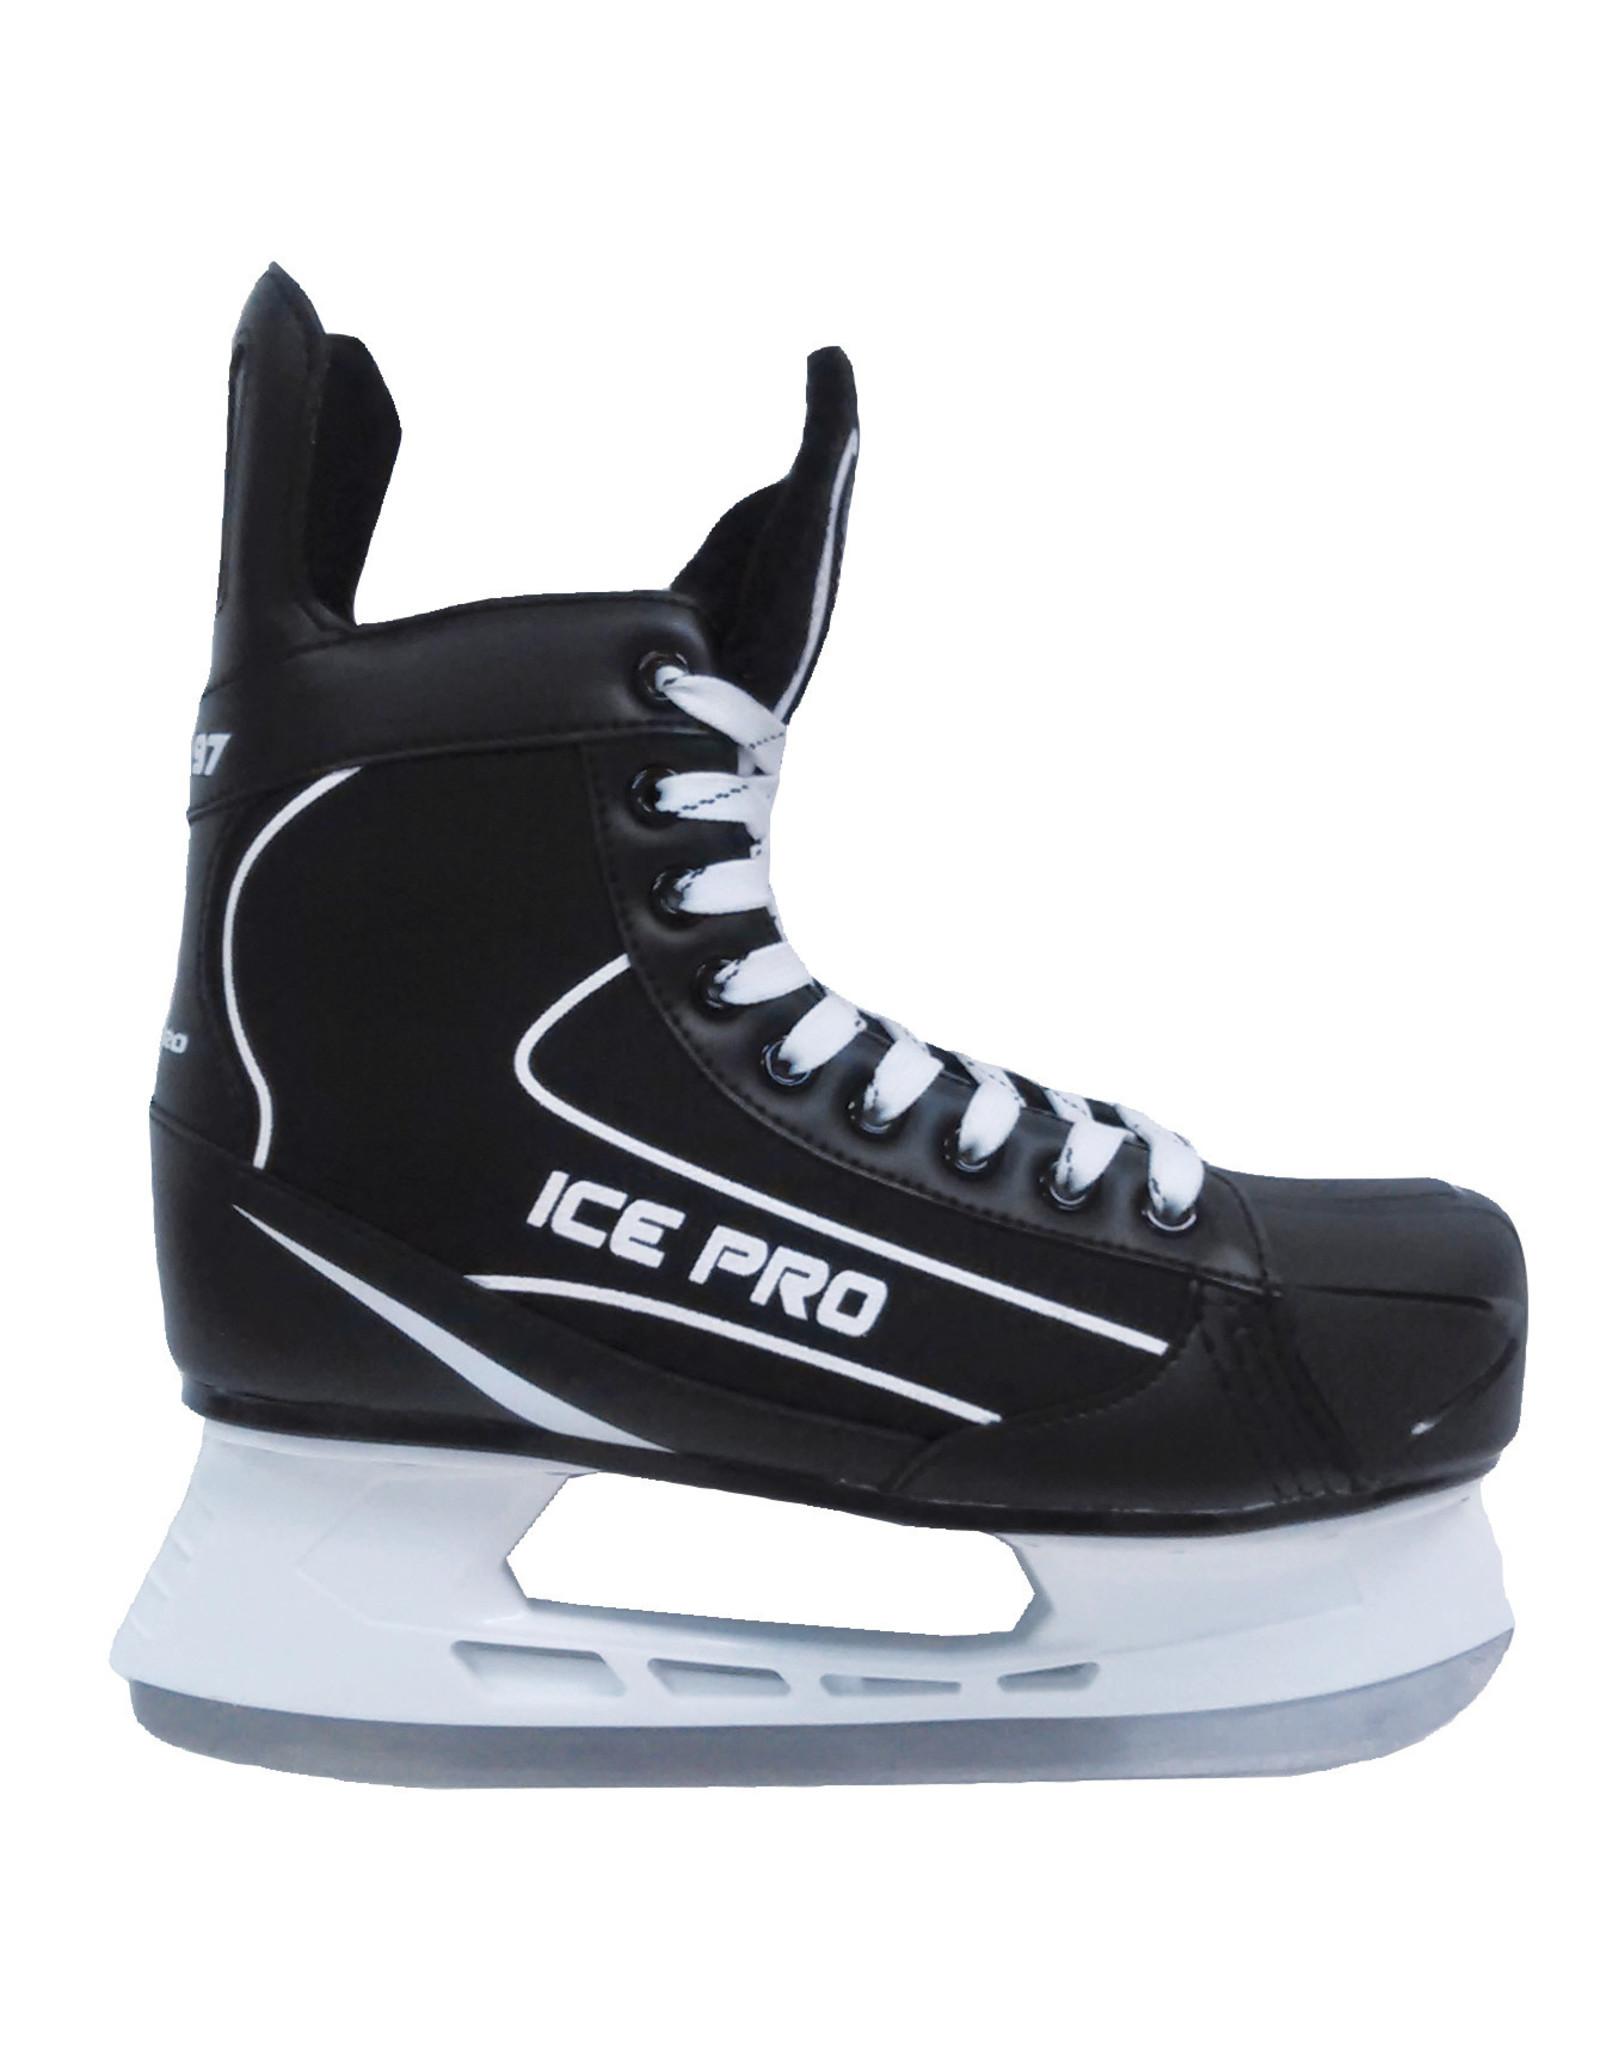 Patin hockey Ice Pro 97 YOUNG 9-13